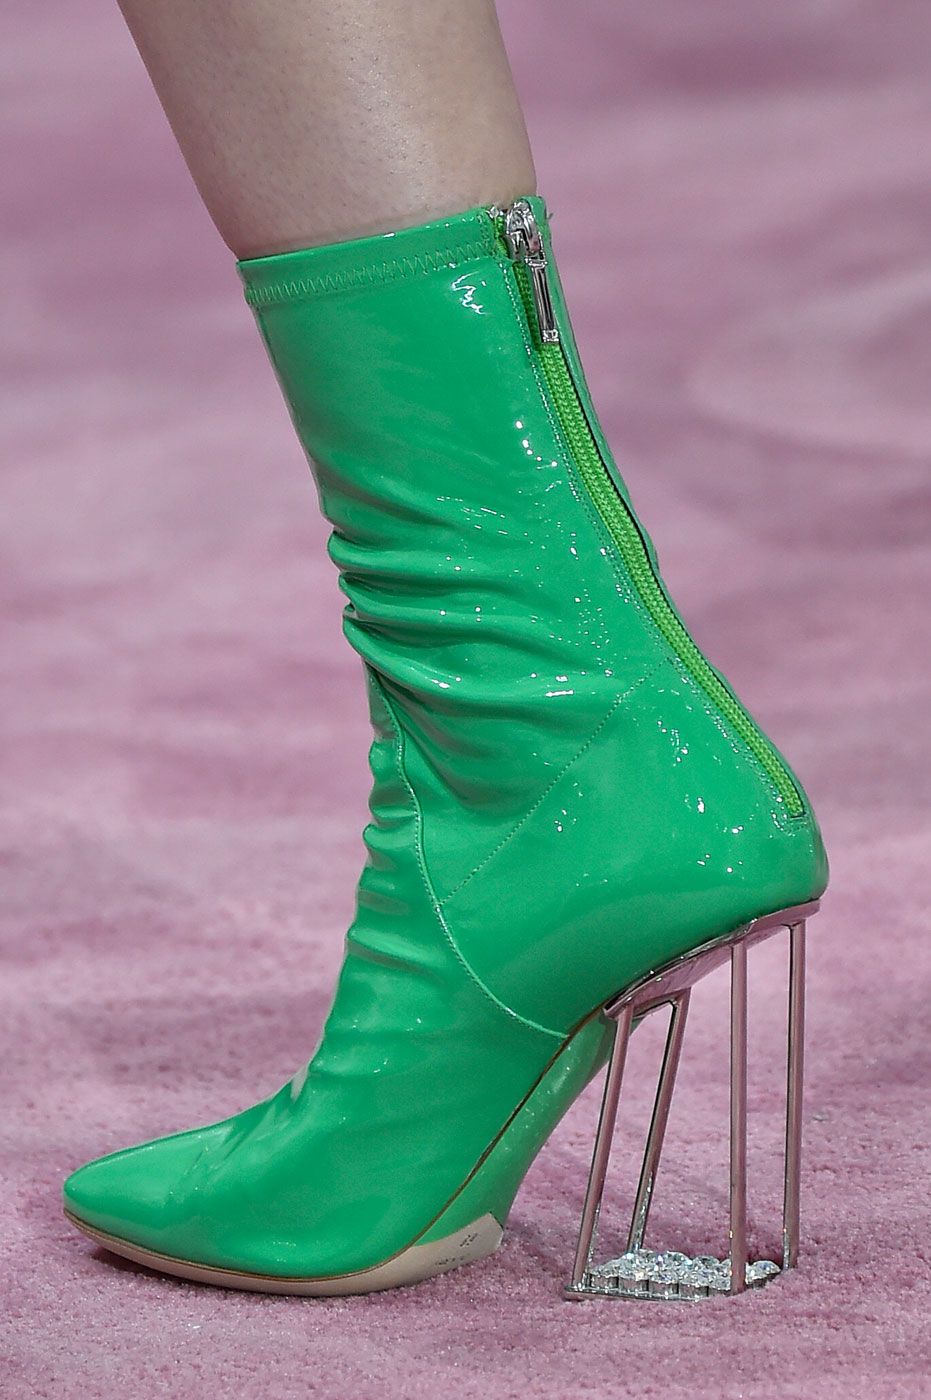 Christian-Dior-fashion-runway-show-close-ups-haute-couture-paris-spring-summer-2015-the-impression-029